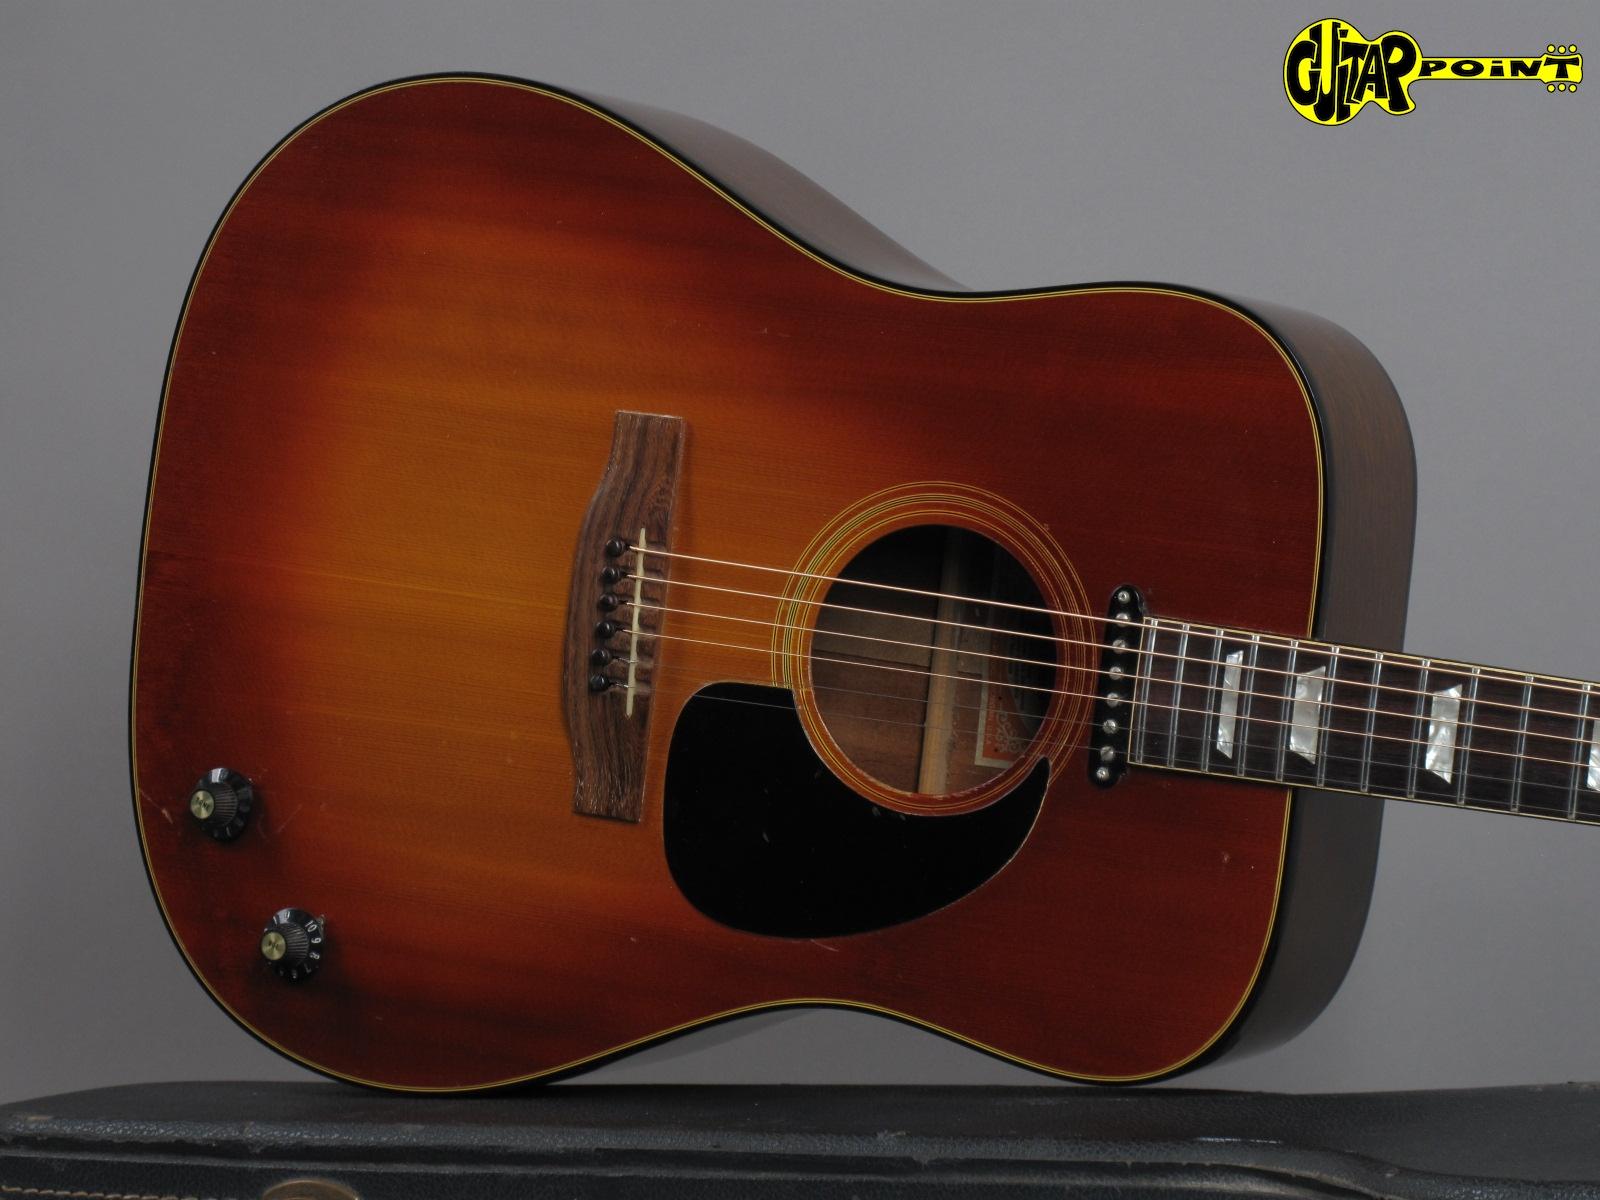 https://guitarpoint.de/app/uploads/products/1974-gibson-ej-160e-sunburst/Gibson76J45SB_A006777_19.jpg